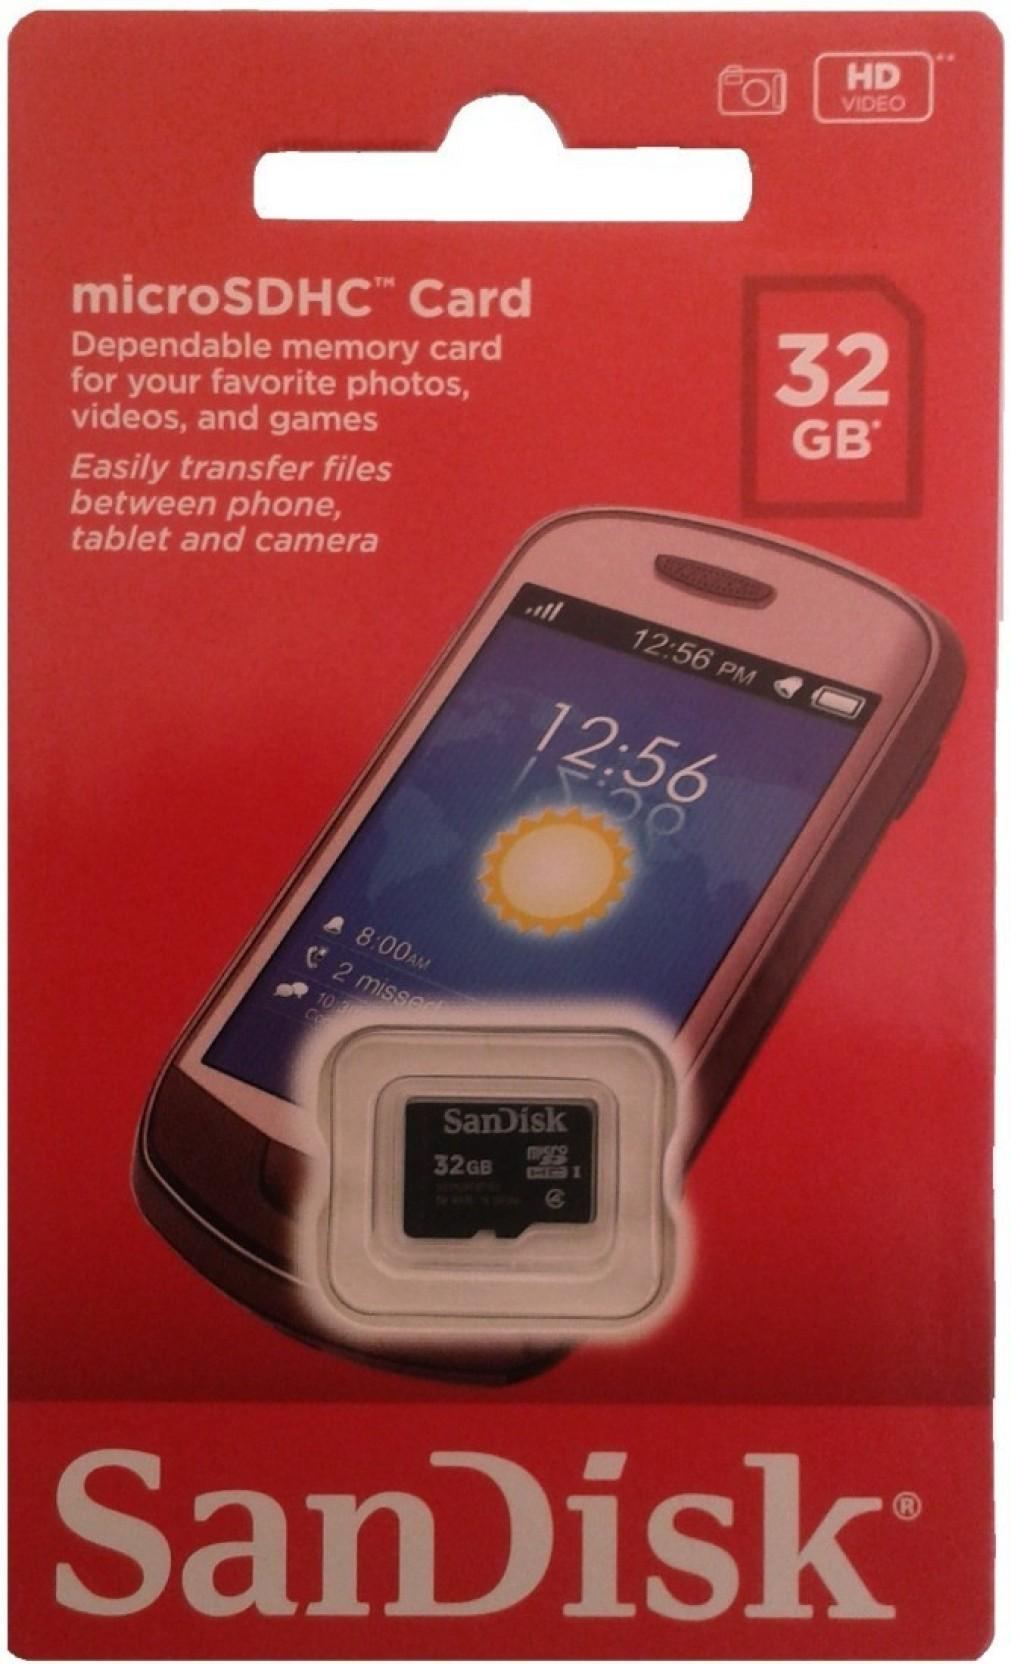 Sandisk Micro 32 Gb Microsd Card Class 4 24 Mb S Memory Log On Turbo Sd Hc 16gb 10 Compare